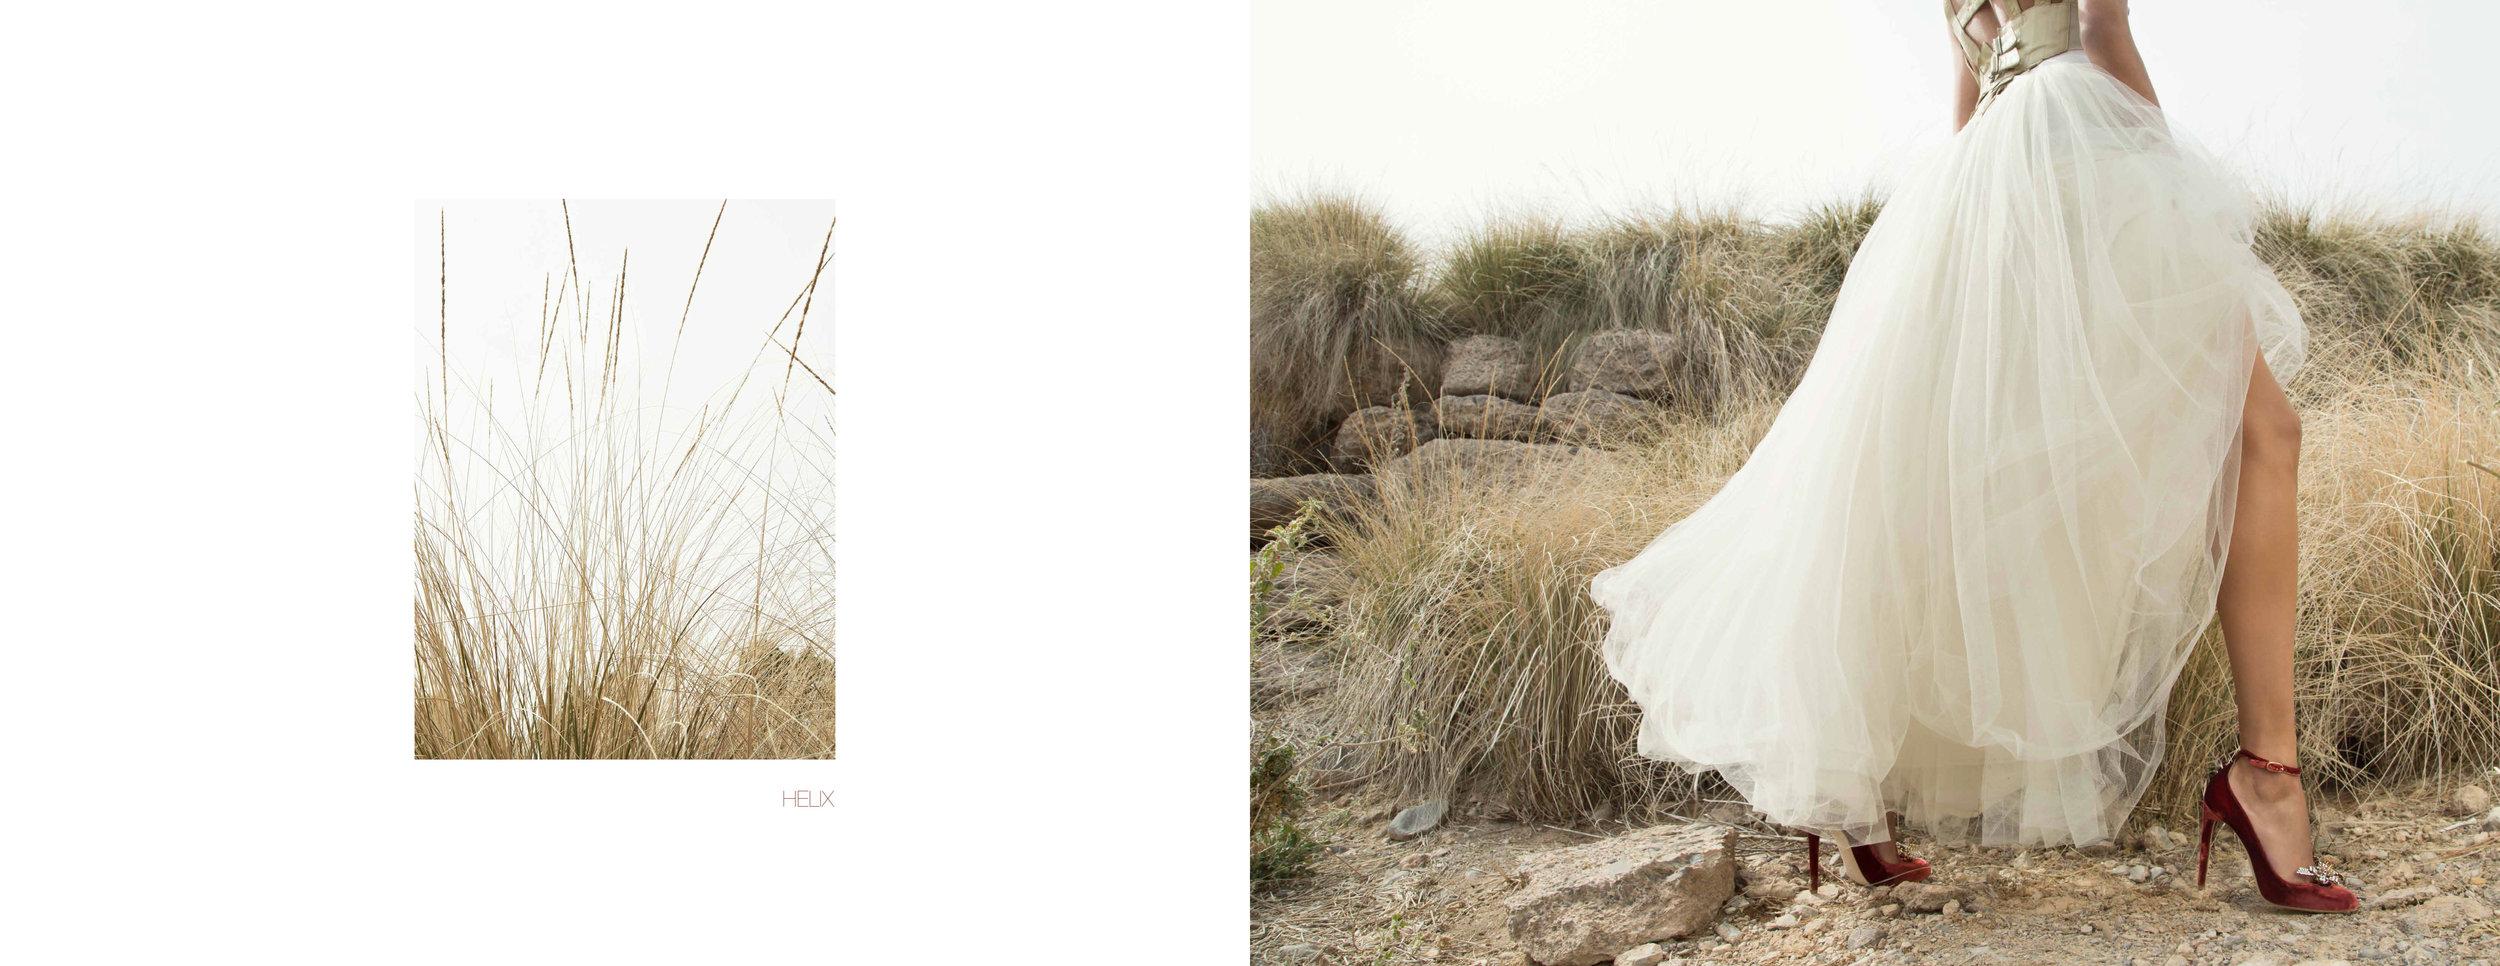 ChloeGosselin-FW17-lookbook1-9.jpg